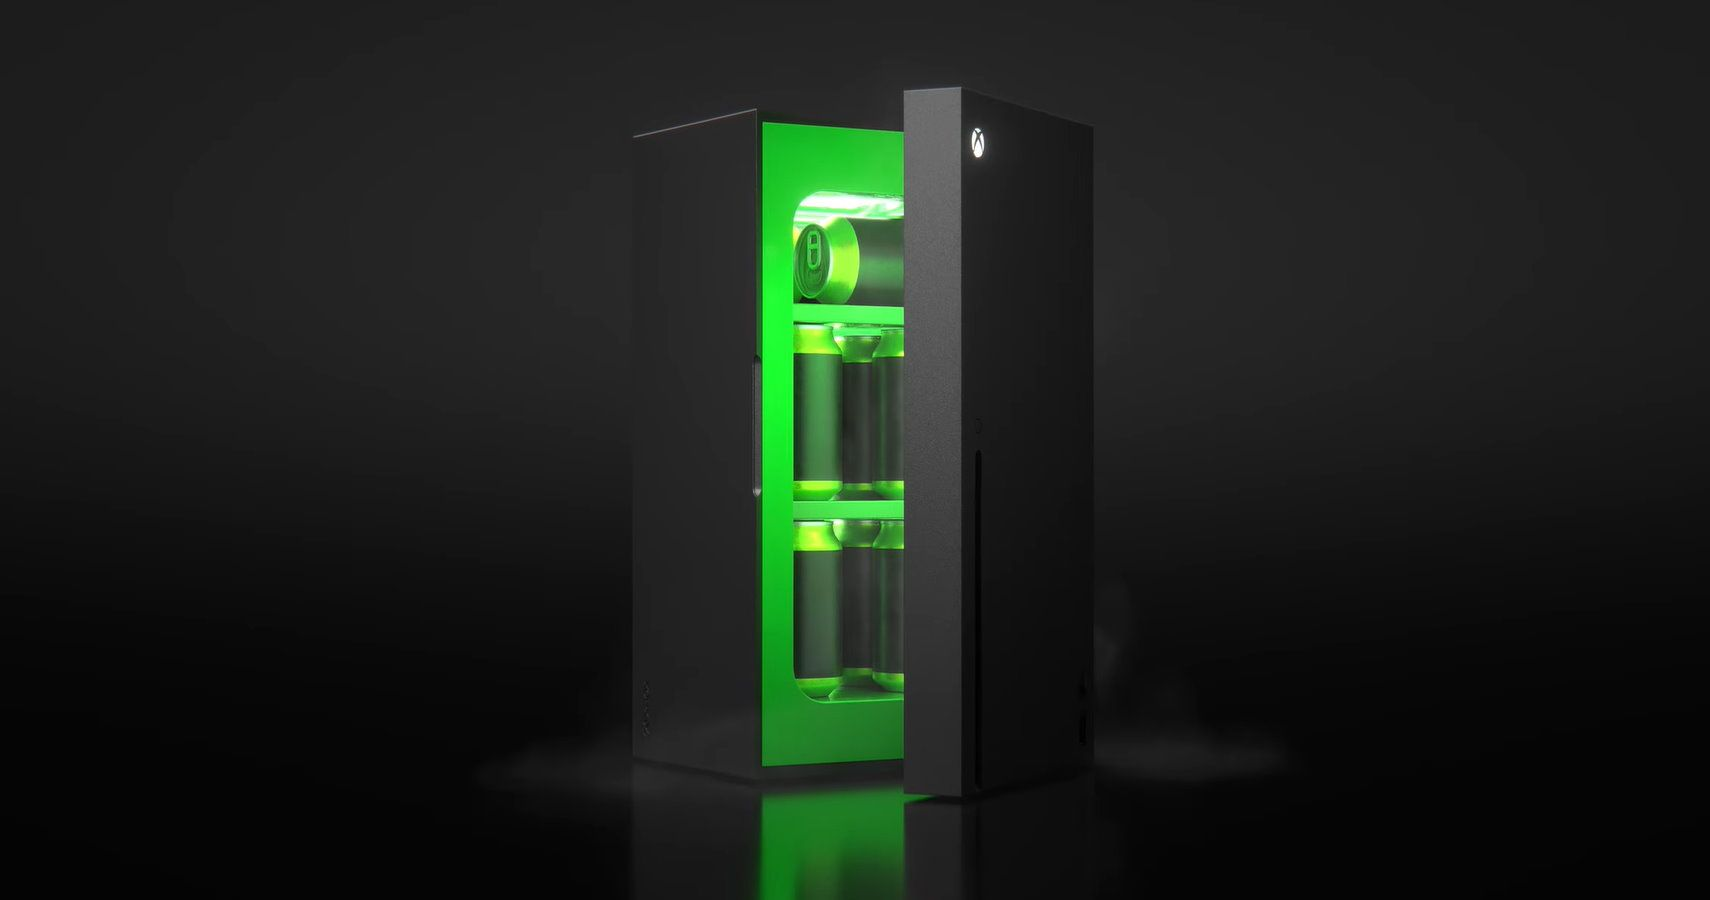 Xbox презентовала мини-холодильник. Трейлер новинки собрал 1,5 млн просмотров за сутки